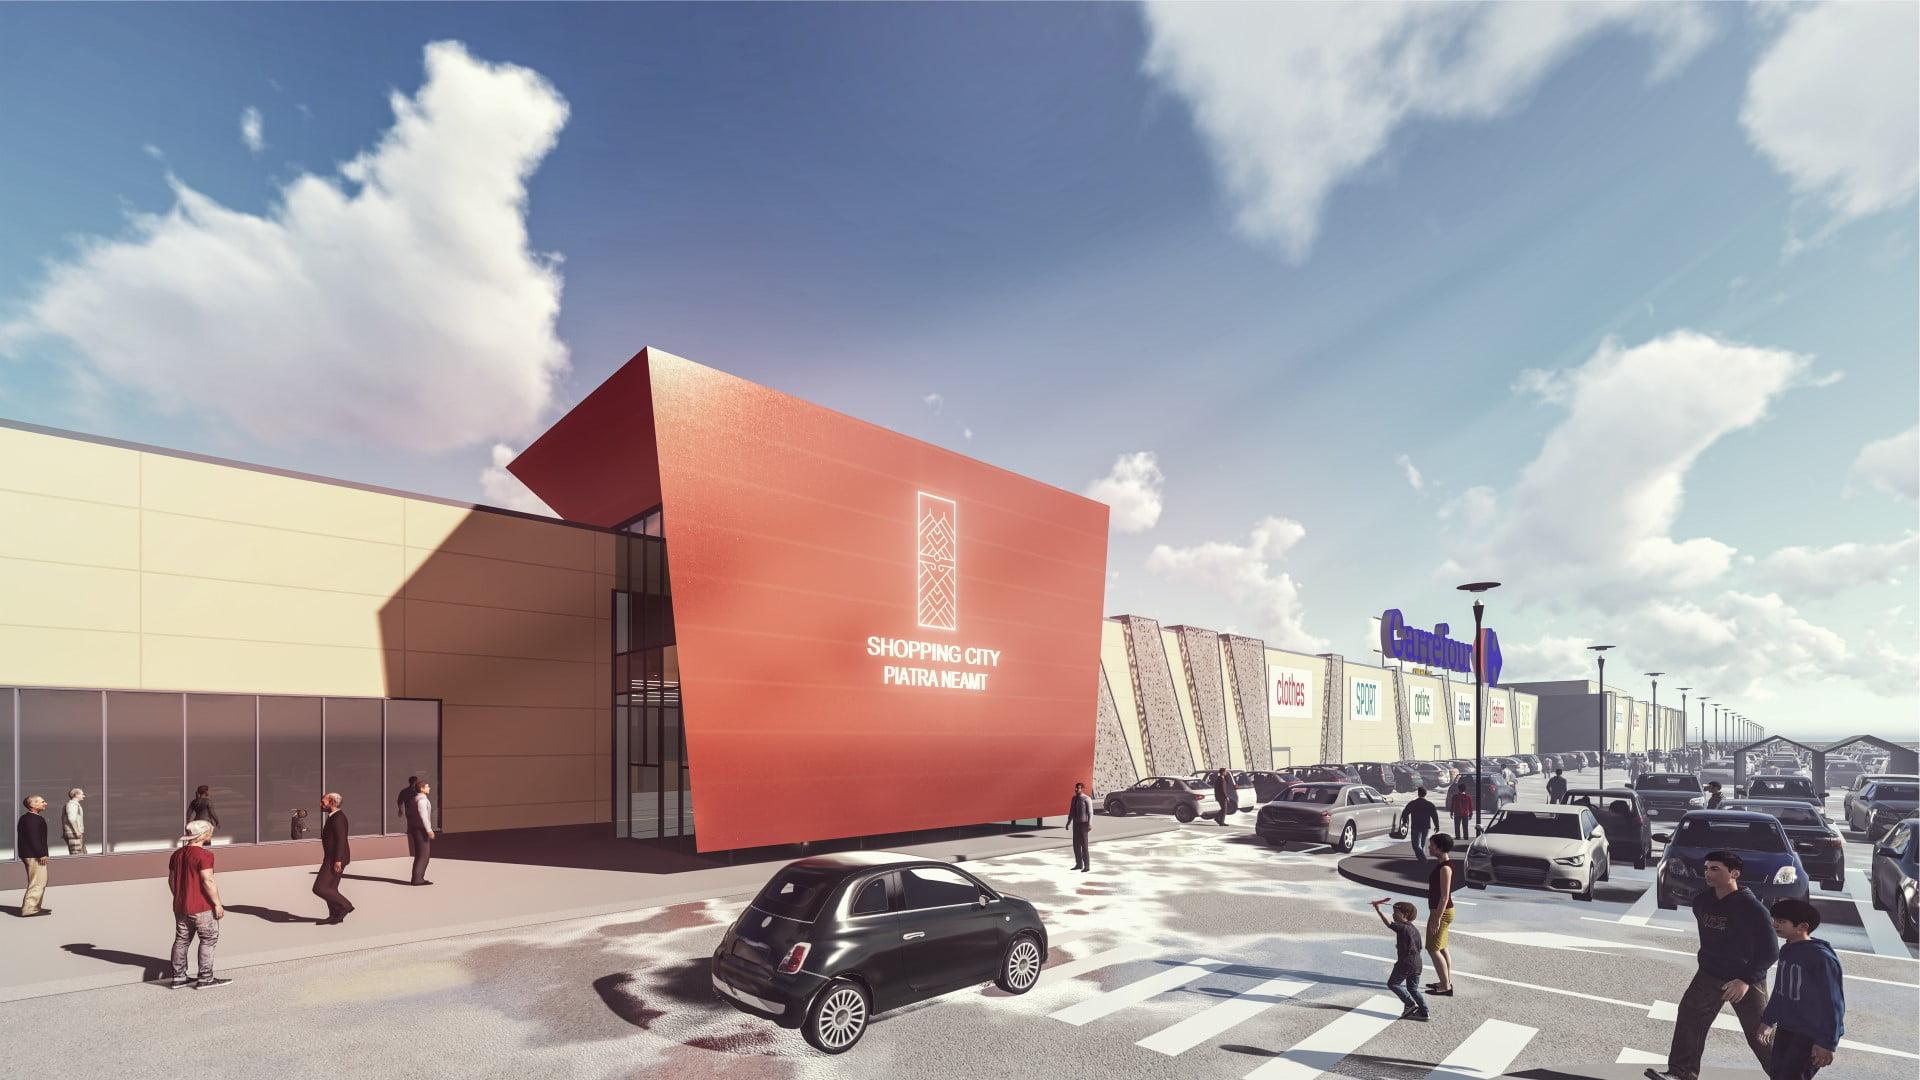 [FOTO] Shopping City Piatra Neamț își deschide porțile pe 1 decembrie